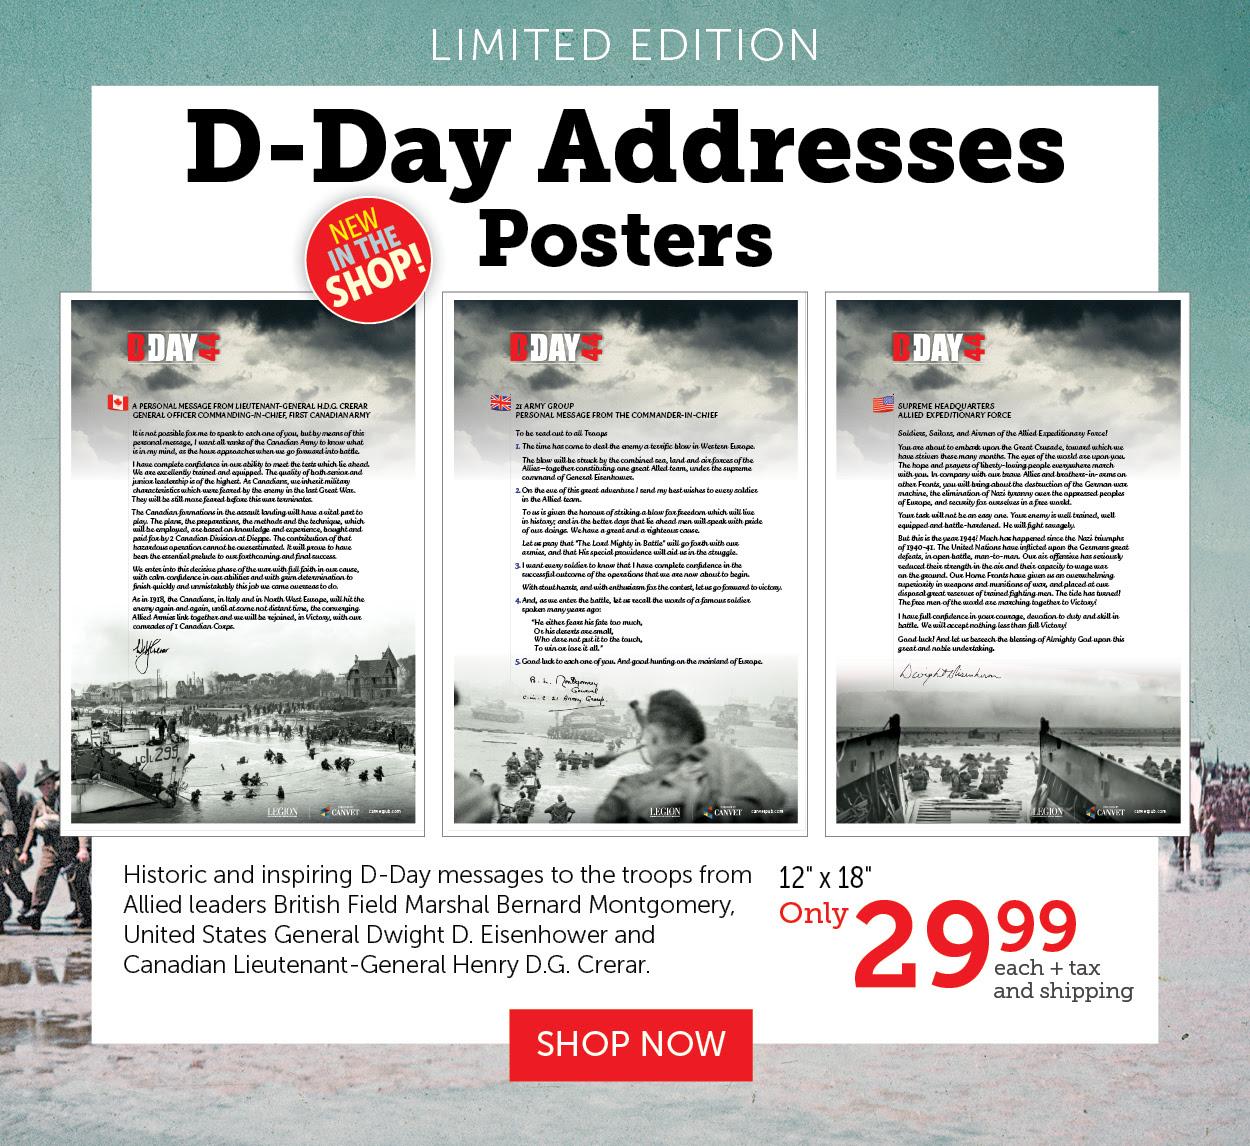 D-Day Addresses